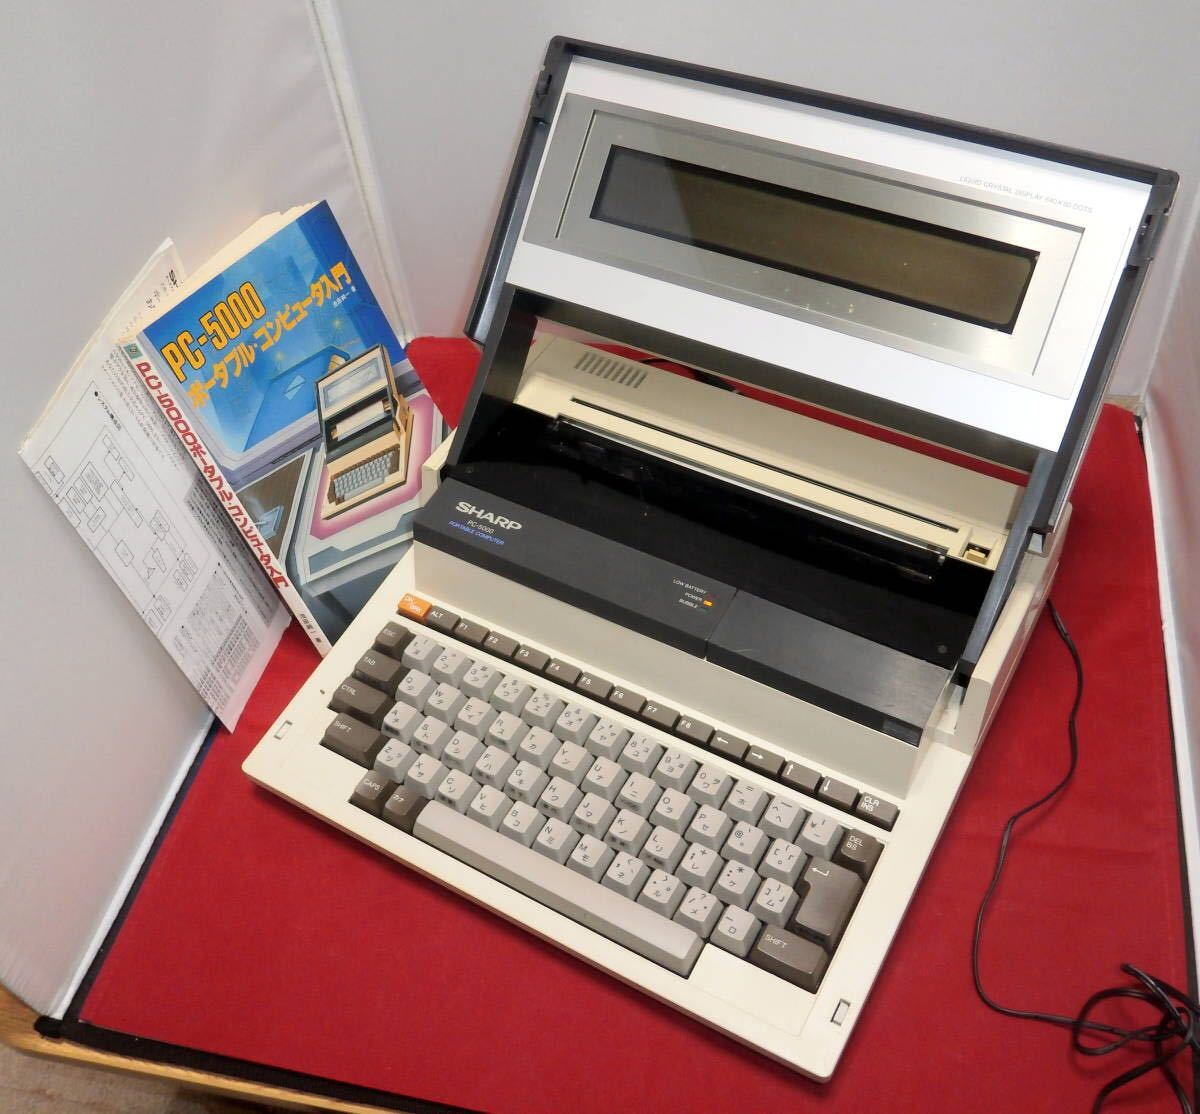 SHARP PC-5000 プリンタCE-510P・BASIC-ROM・増設メモリ・漢字ROM・ワープロソフト・修理改造・互換ACアダプタ・書籍・カタログ付・液晶難